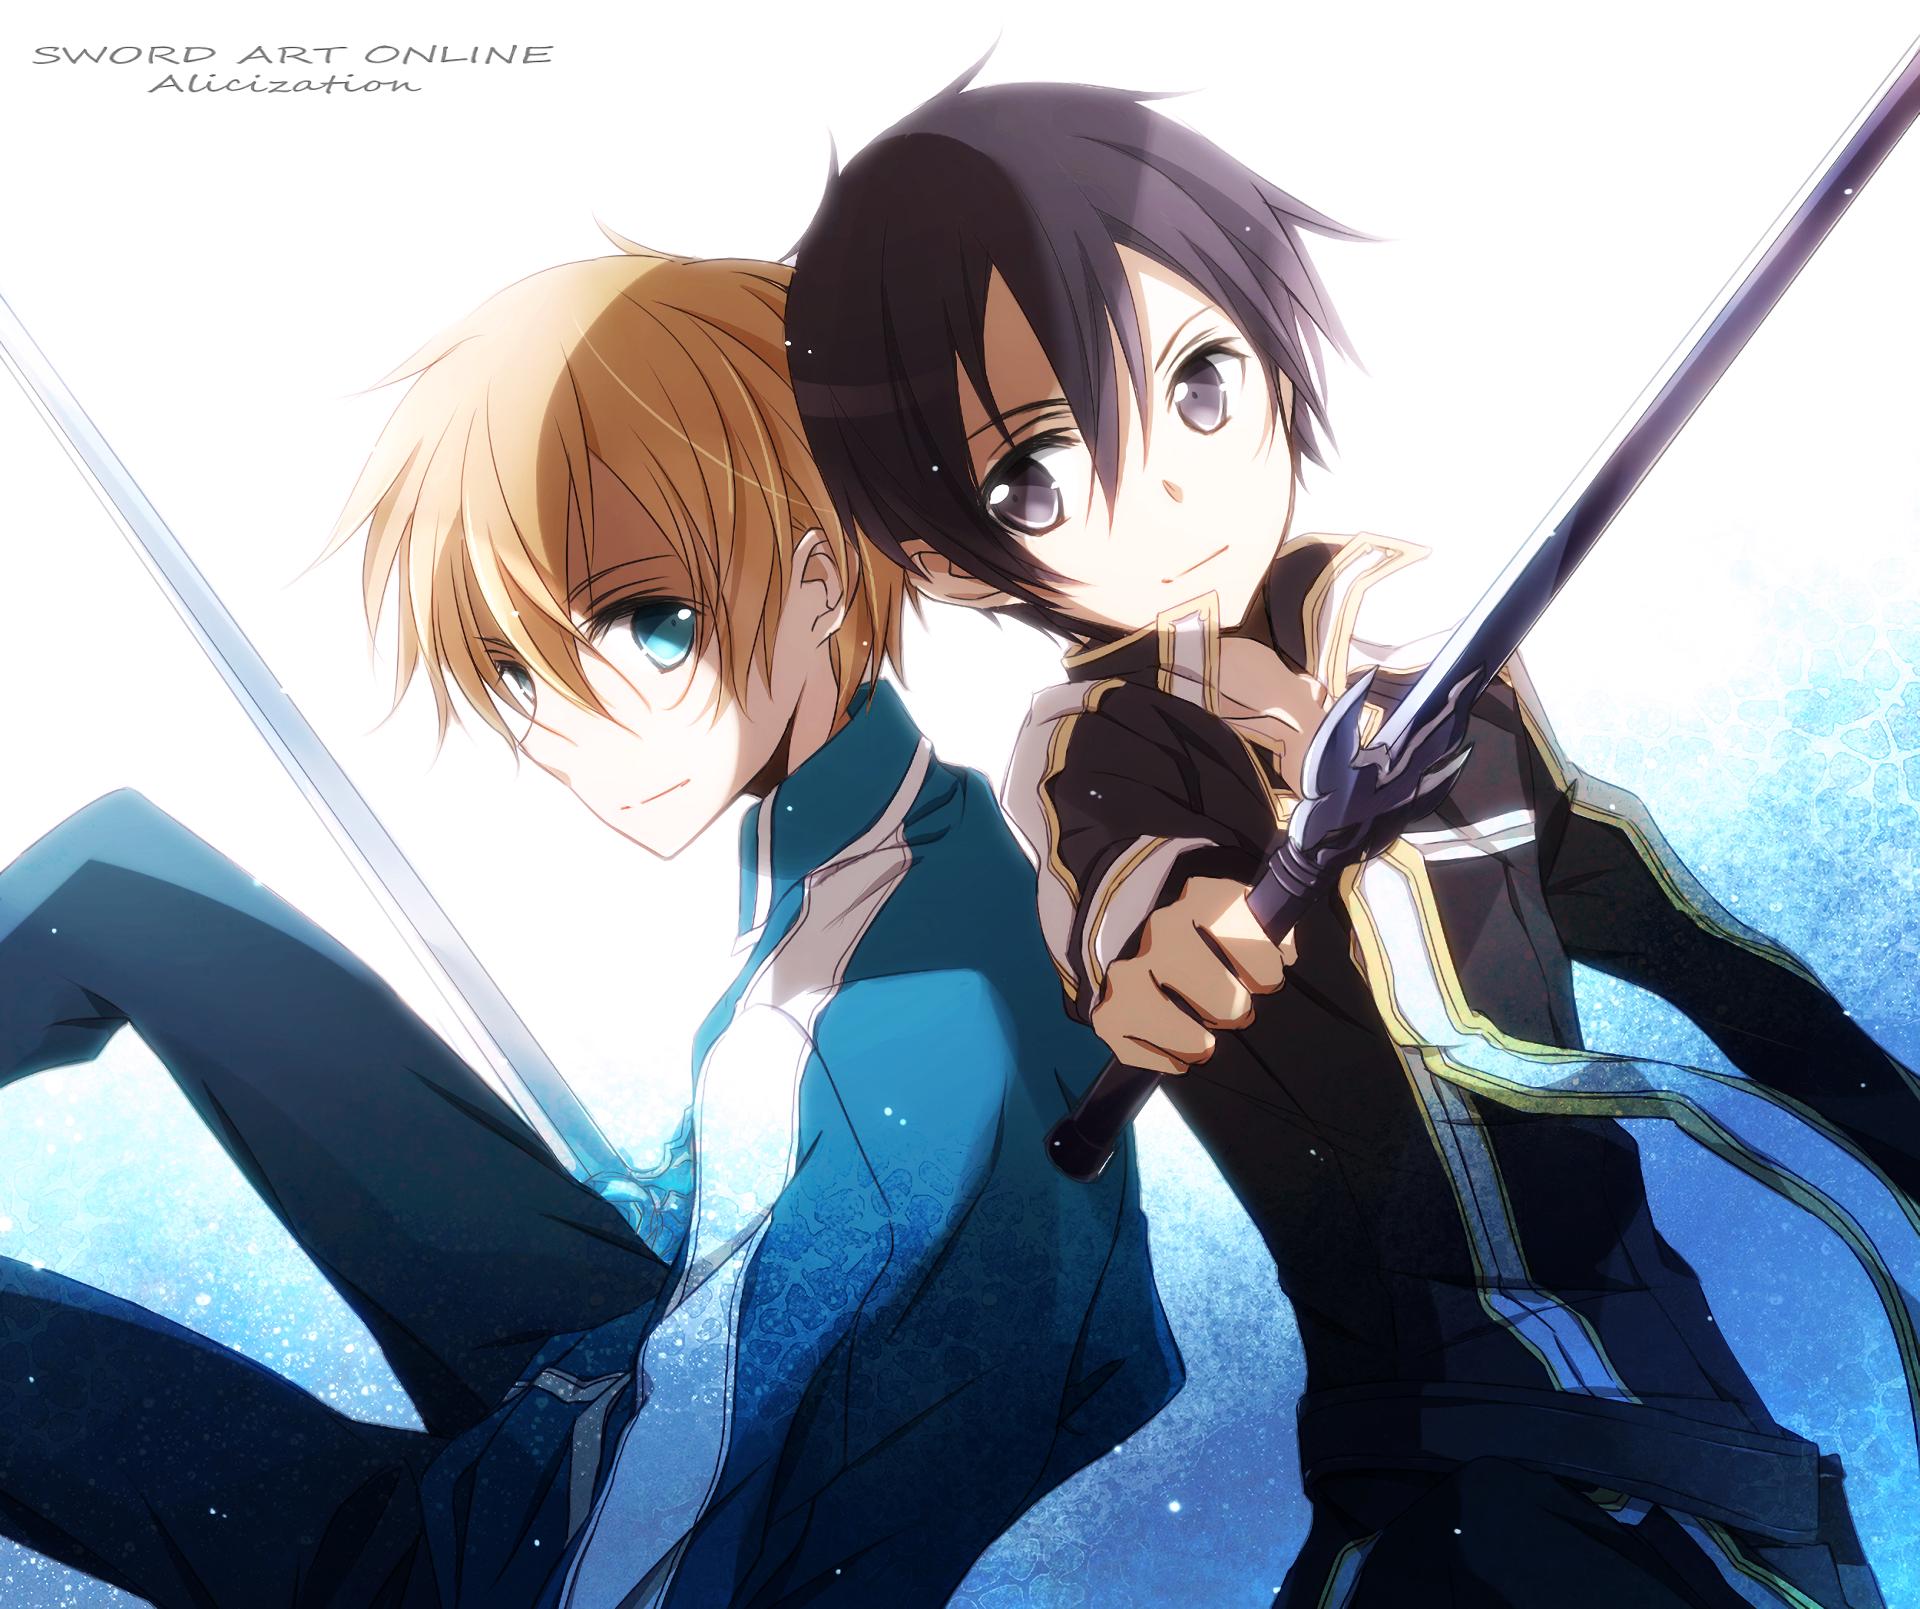 Online Wallpaper: Sword Art Online HD Wallpaper